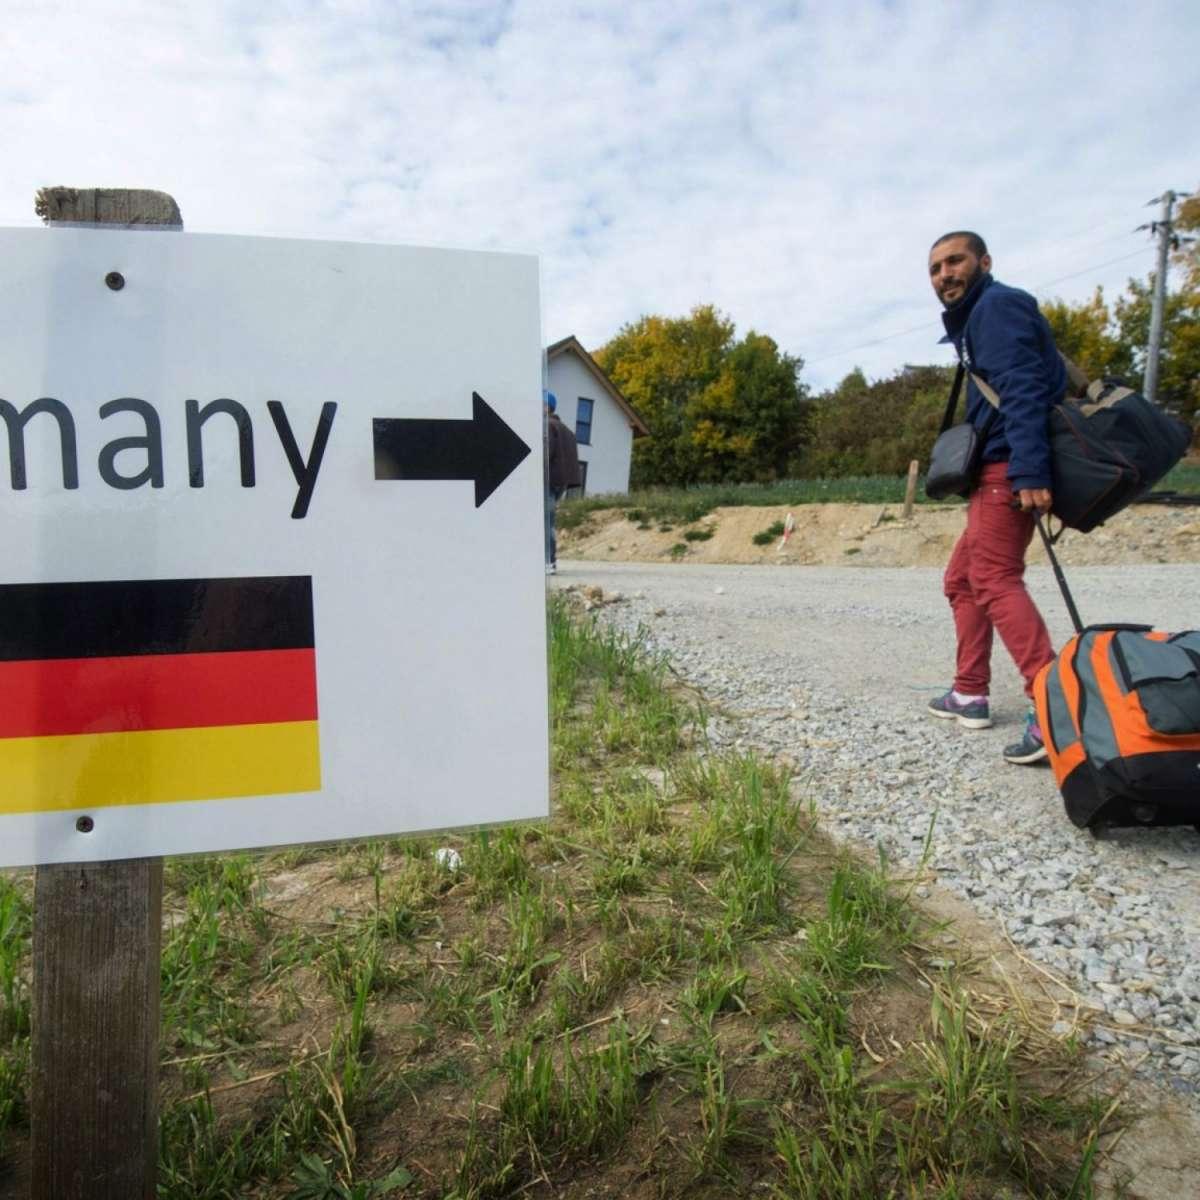 Европу захватил вирус толерантности